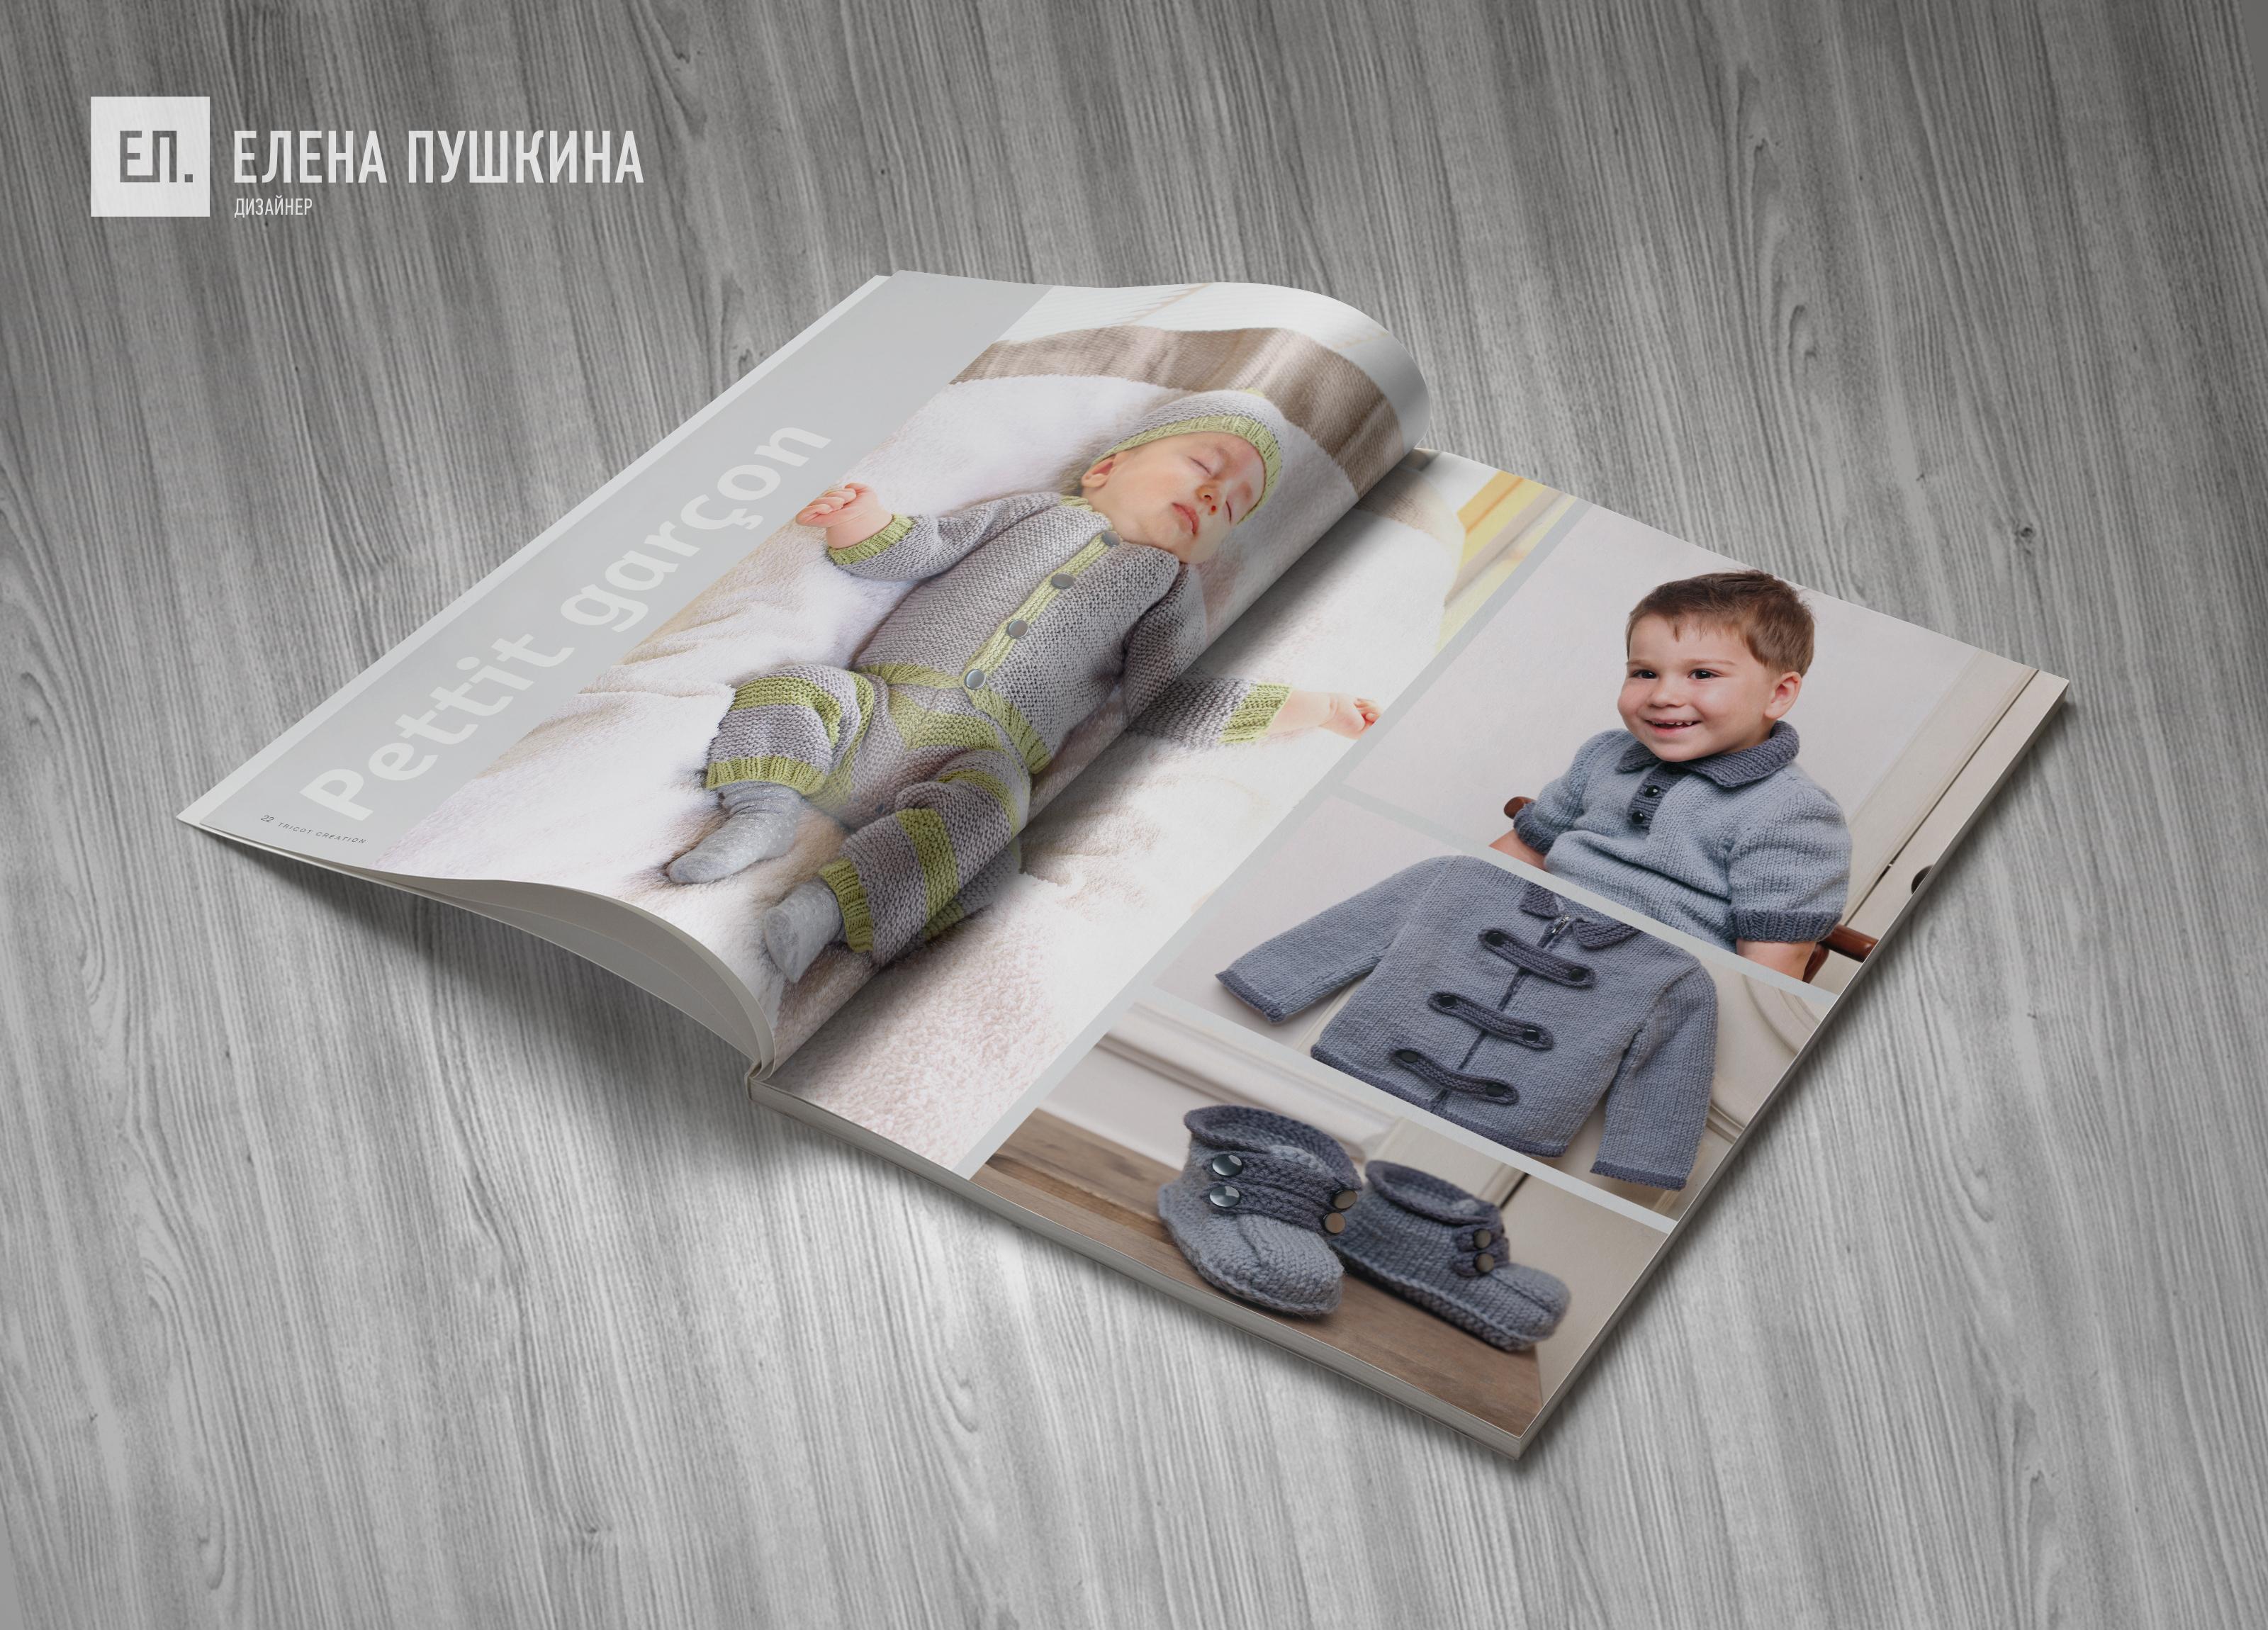 Журнал «MCOT» 04 2012 длямедиа холдинга «Multimedia Press»— разработка дизайна, цветокоррекция ивёрстка журнала Разработка журналов Портфолио